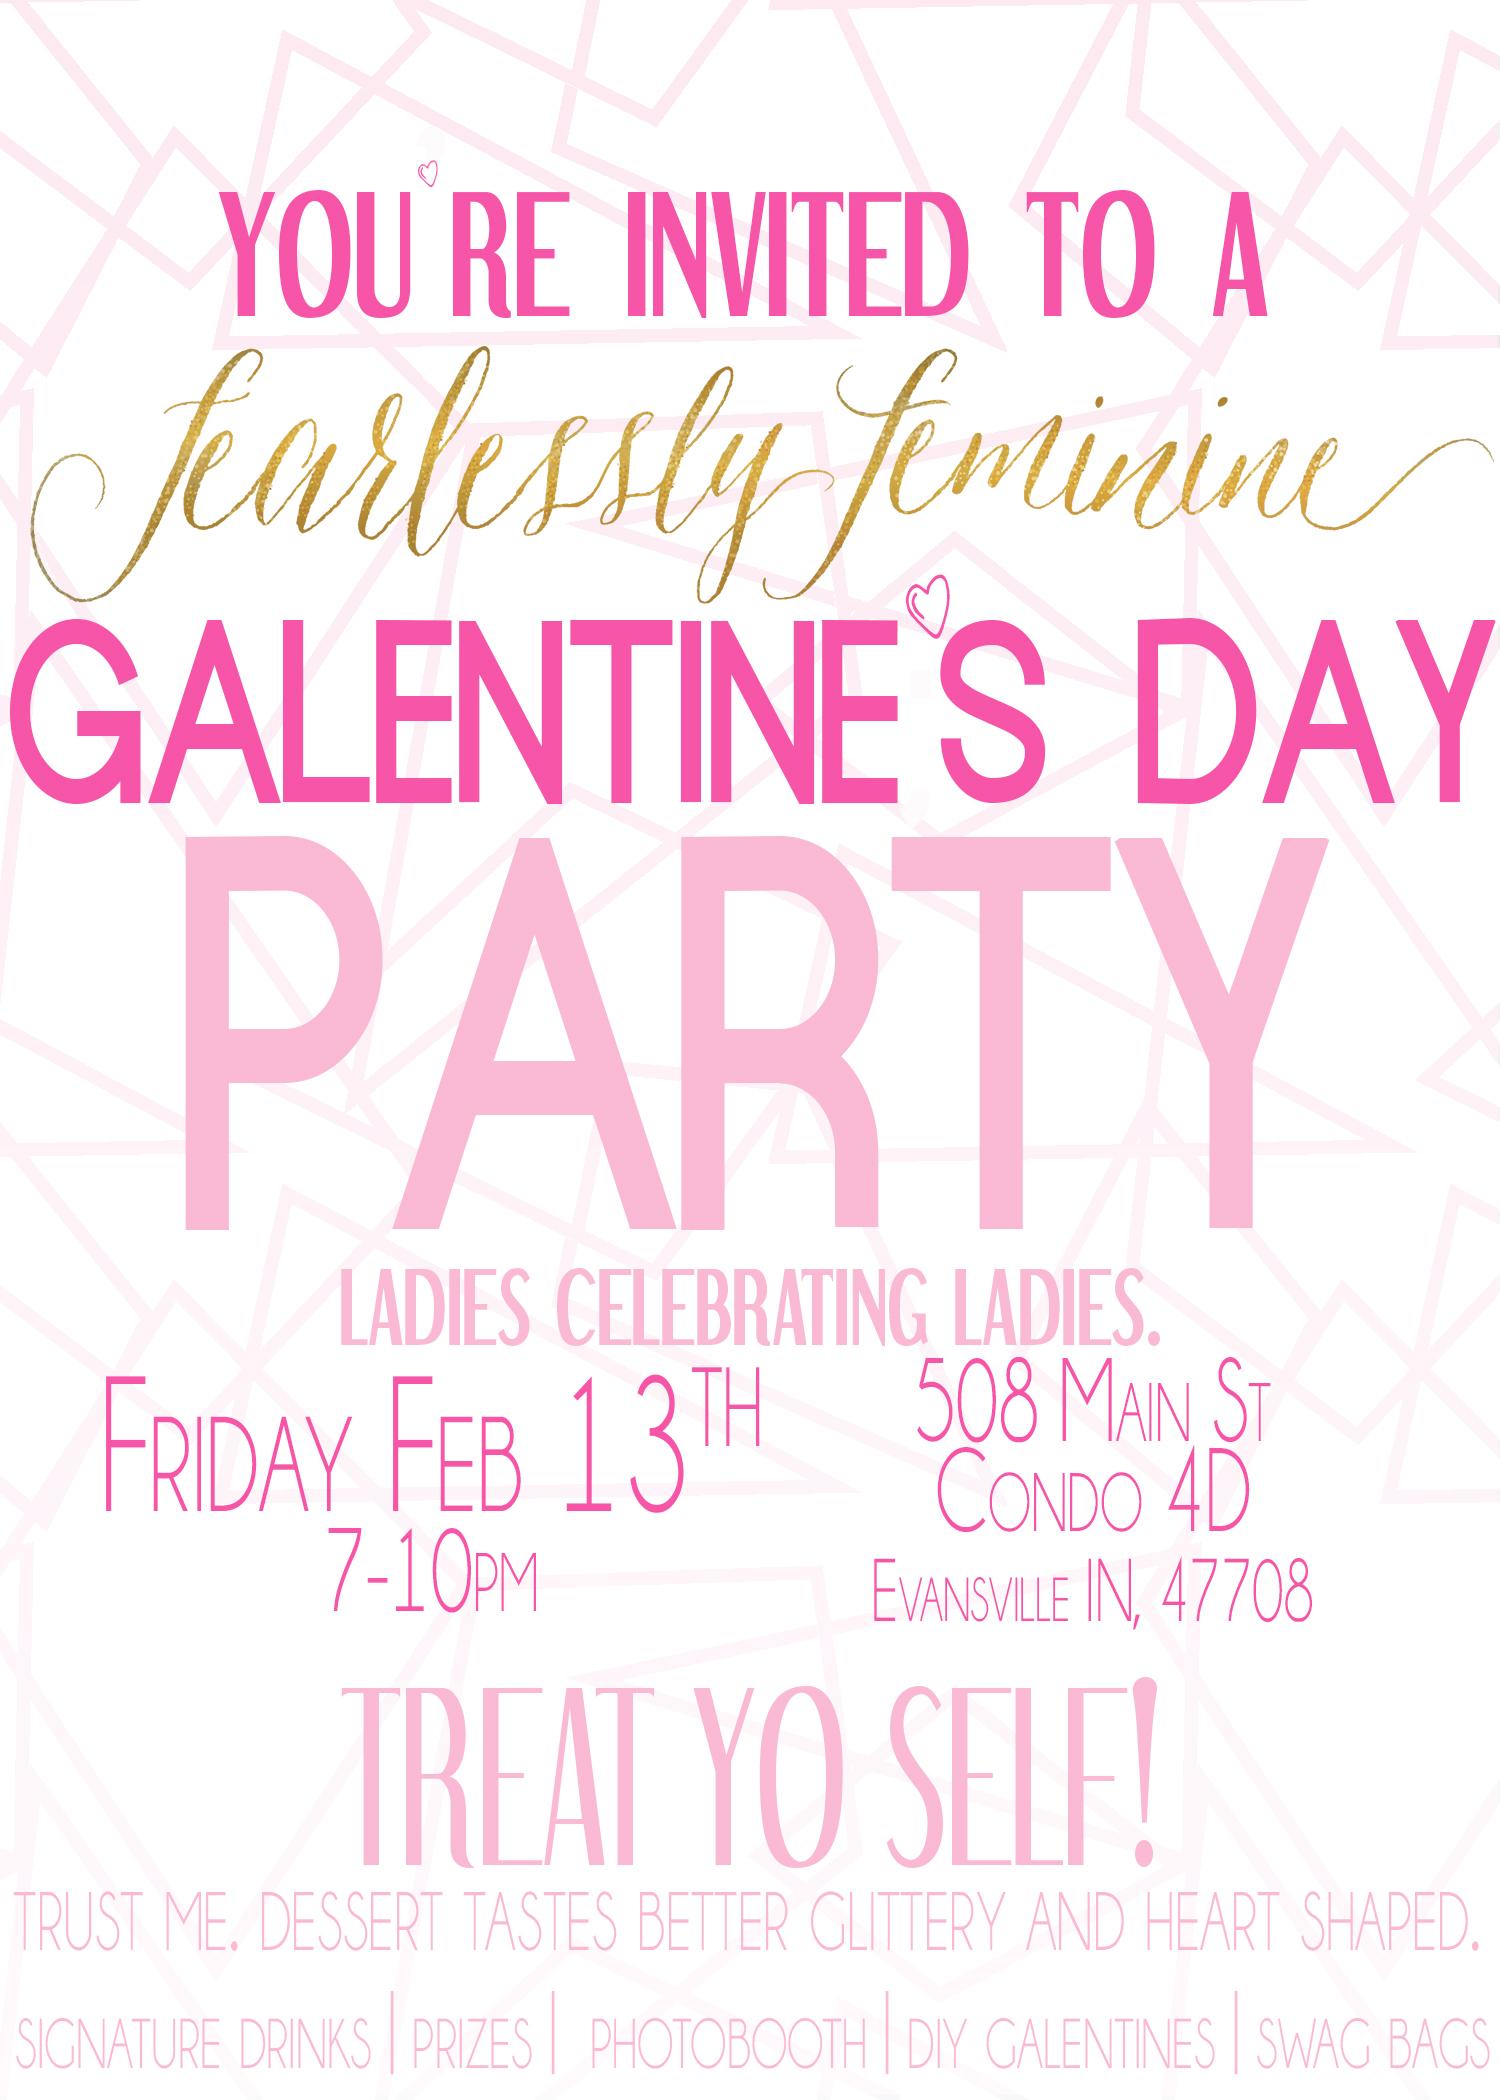 Ladies Celebrating Ladies Galentines Day Evansville IN